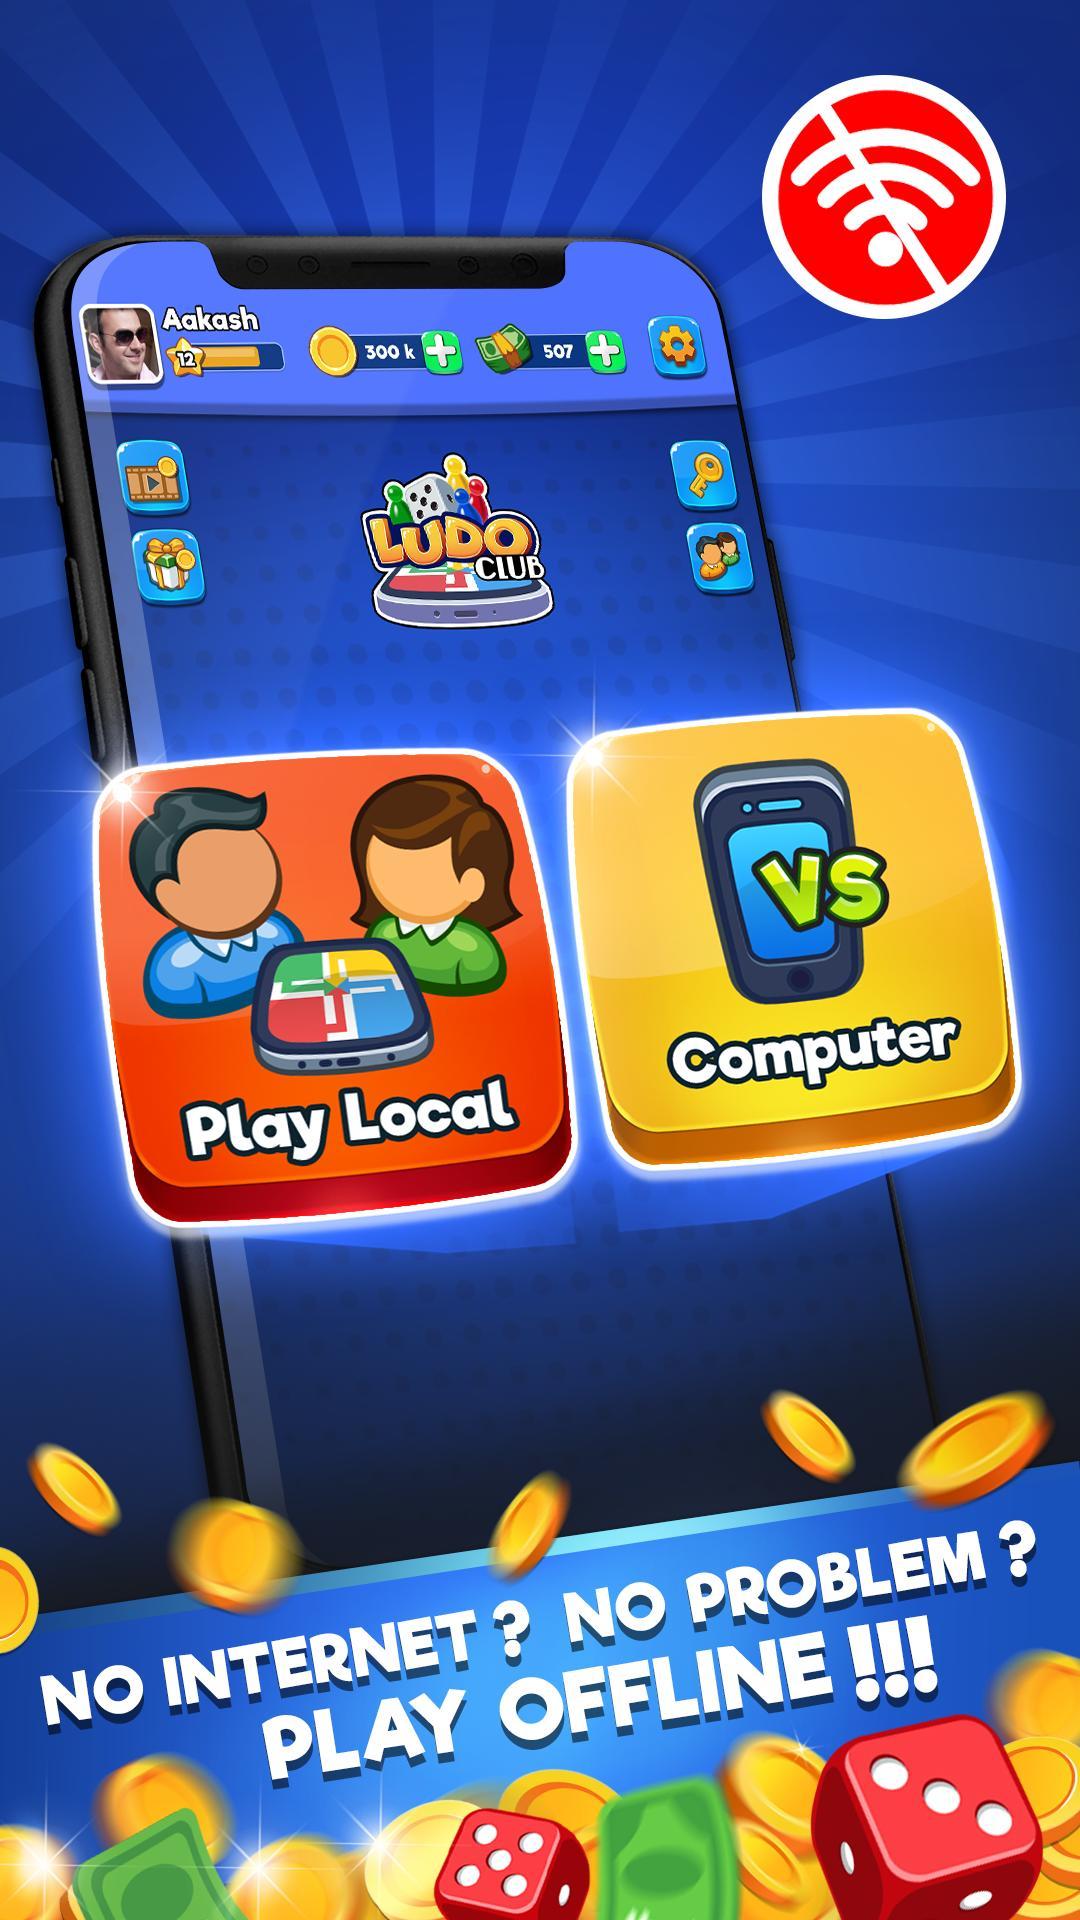 Ludo Club Fun Dice Game 2.0.44 Screenshot 4